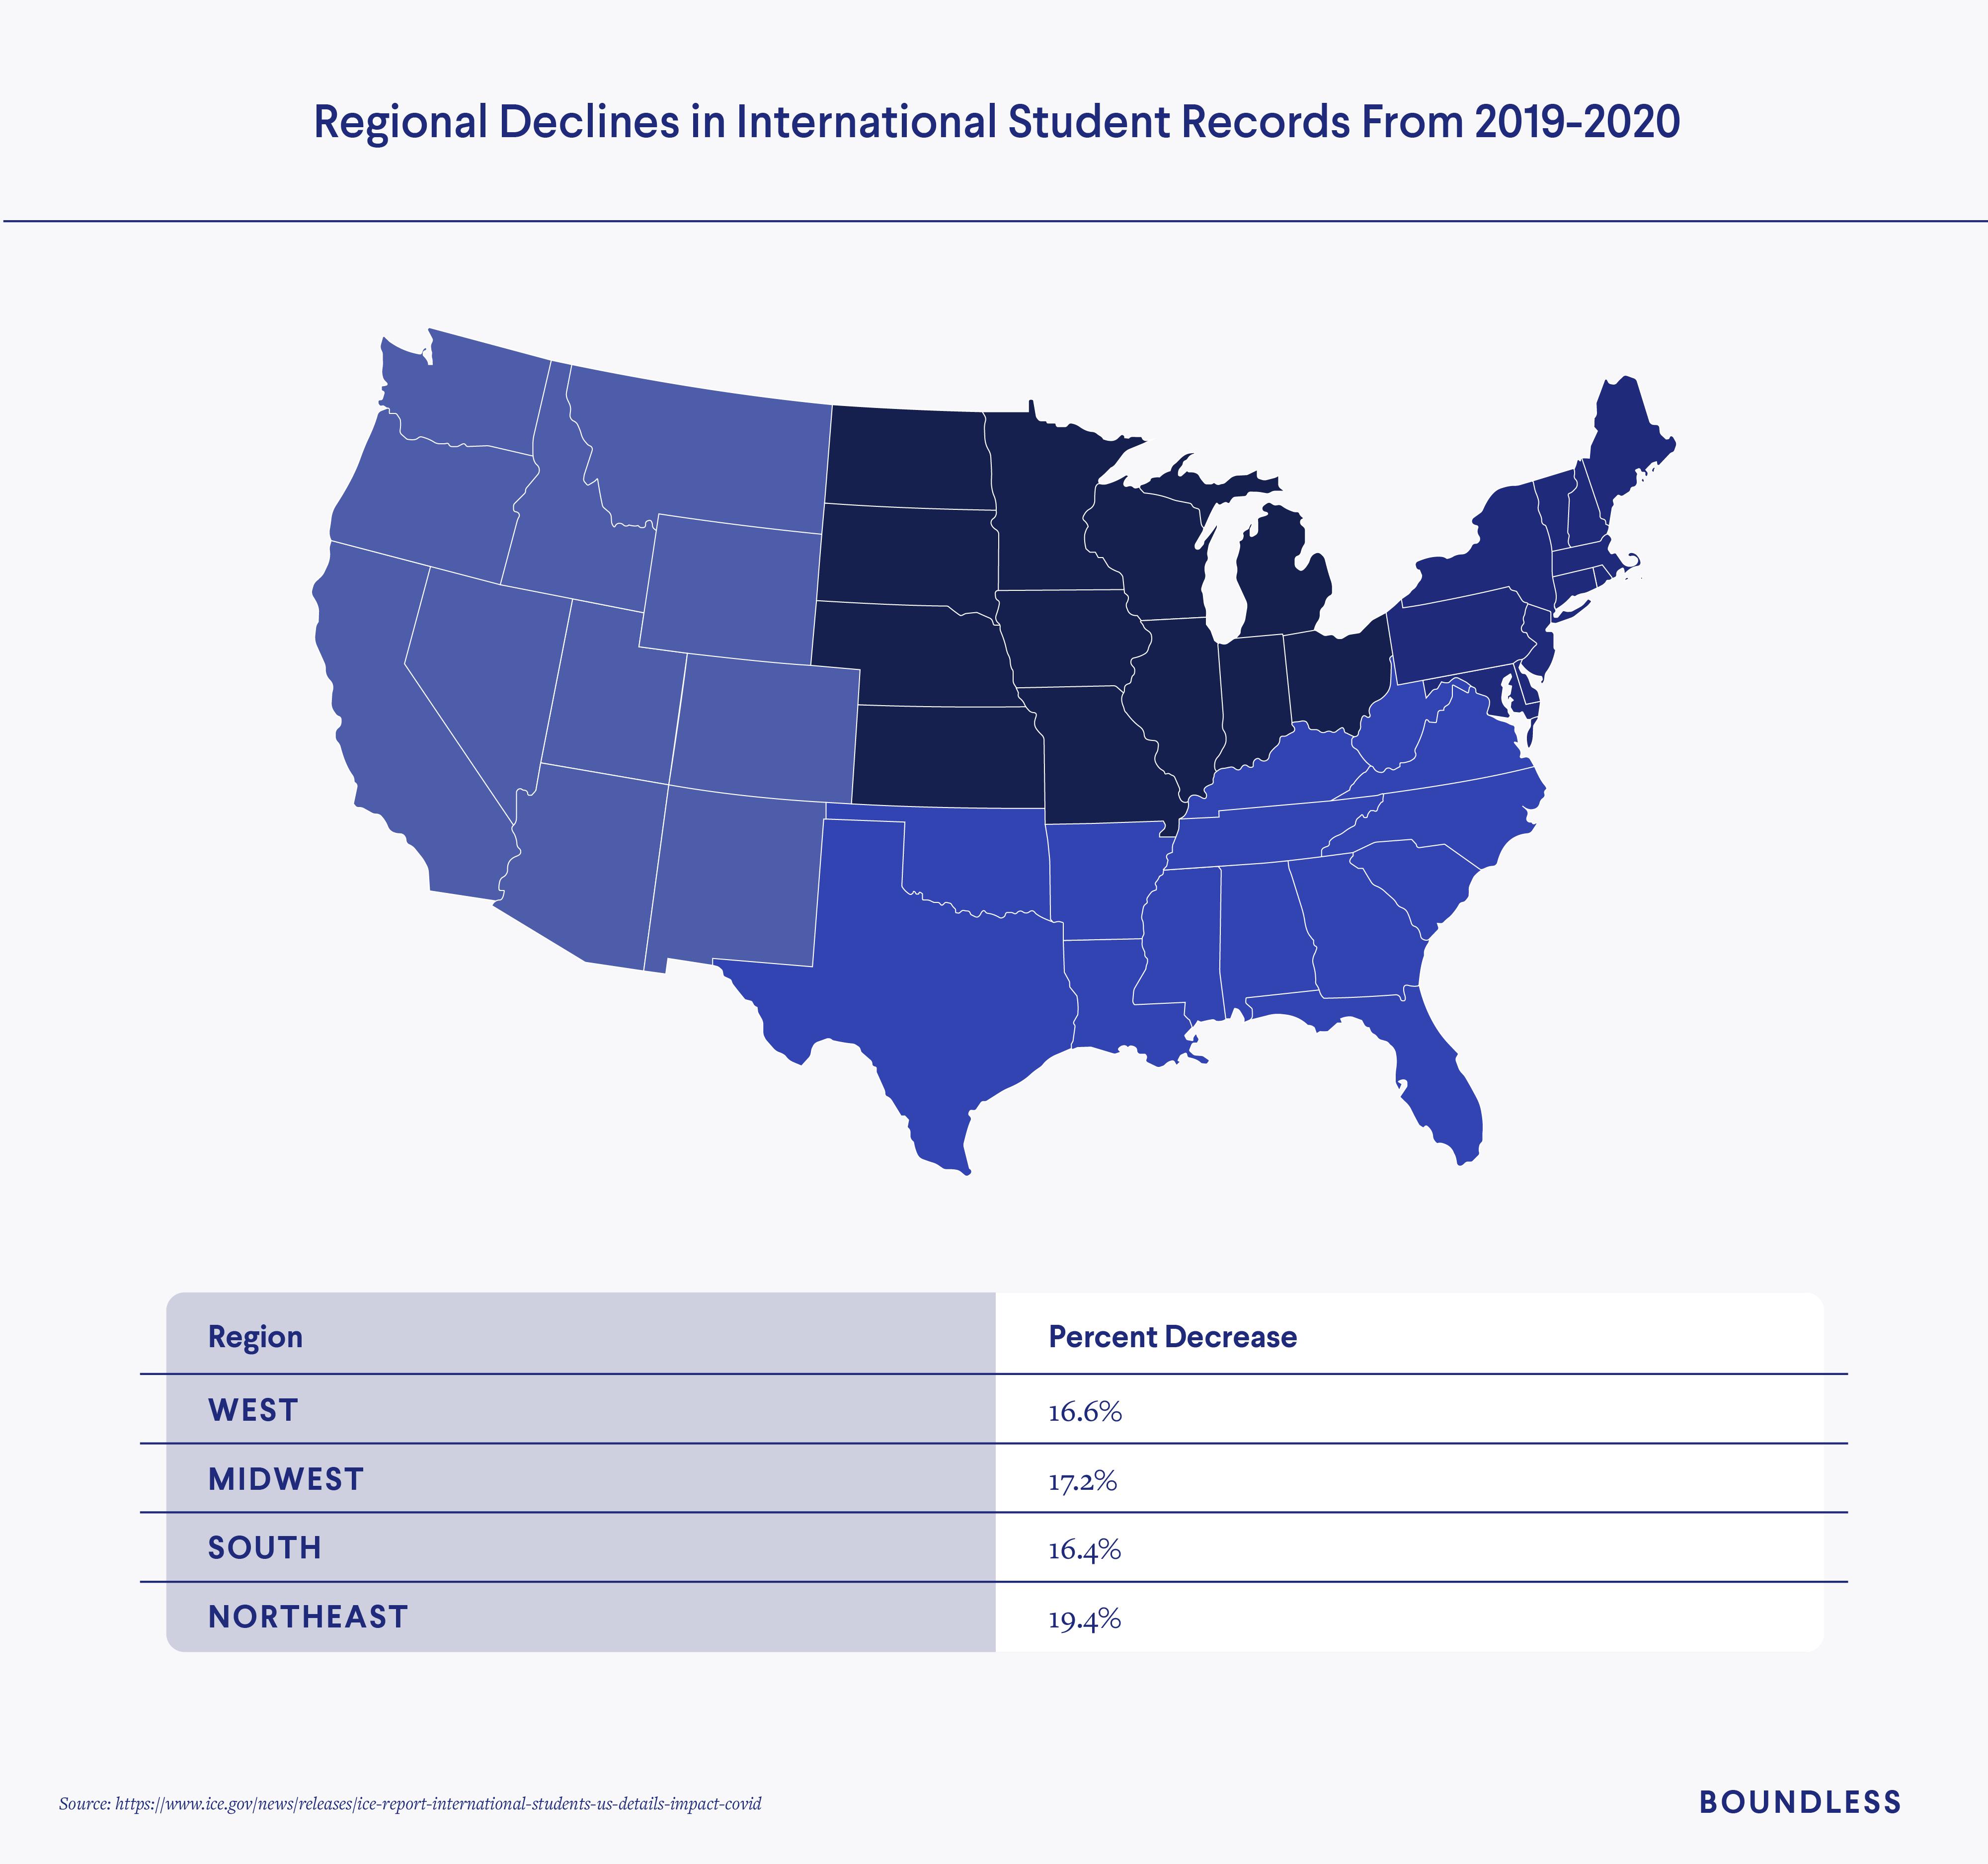 Regional declines in international student enrollment